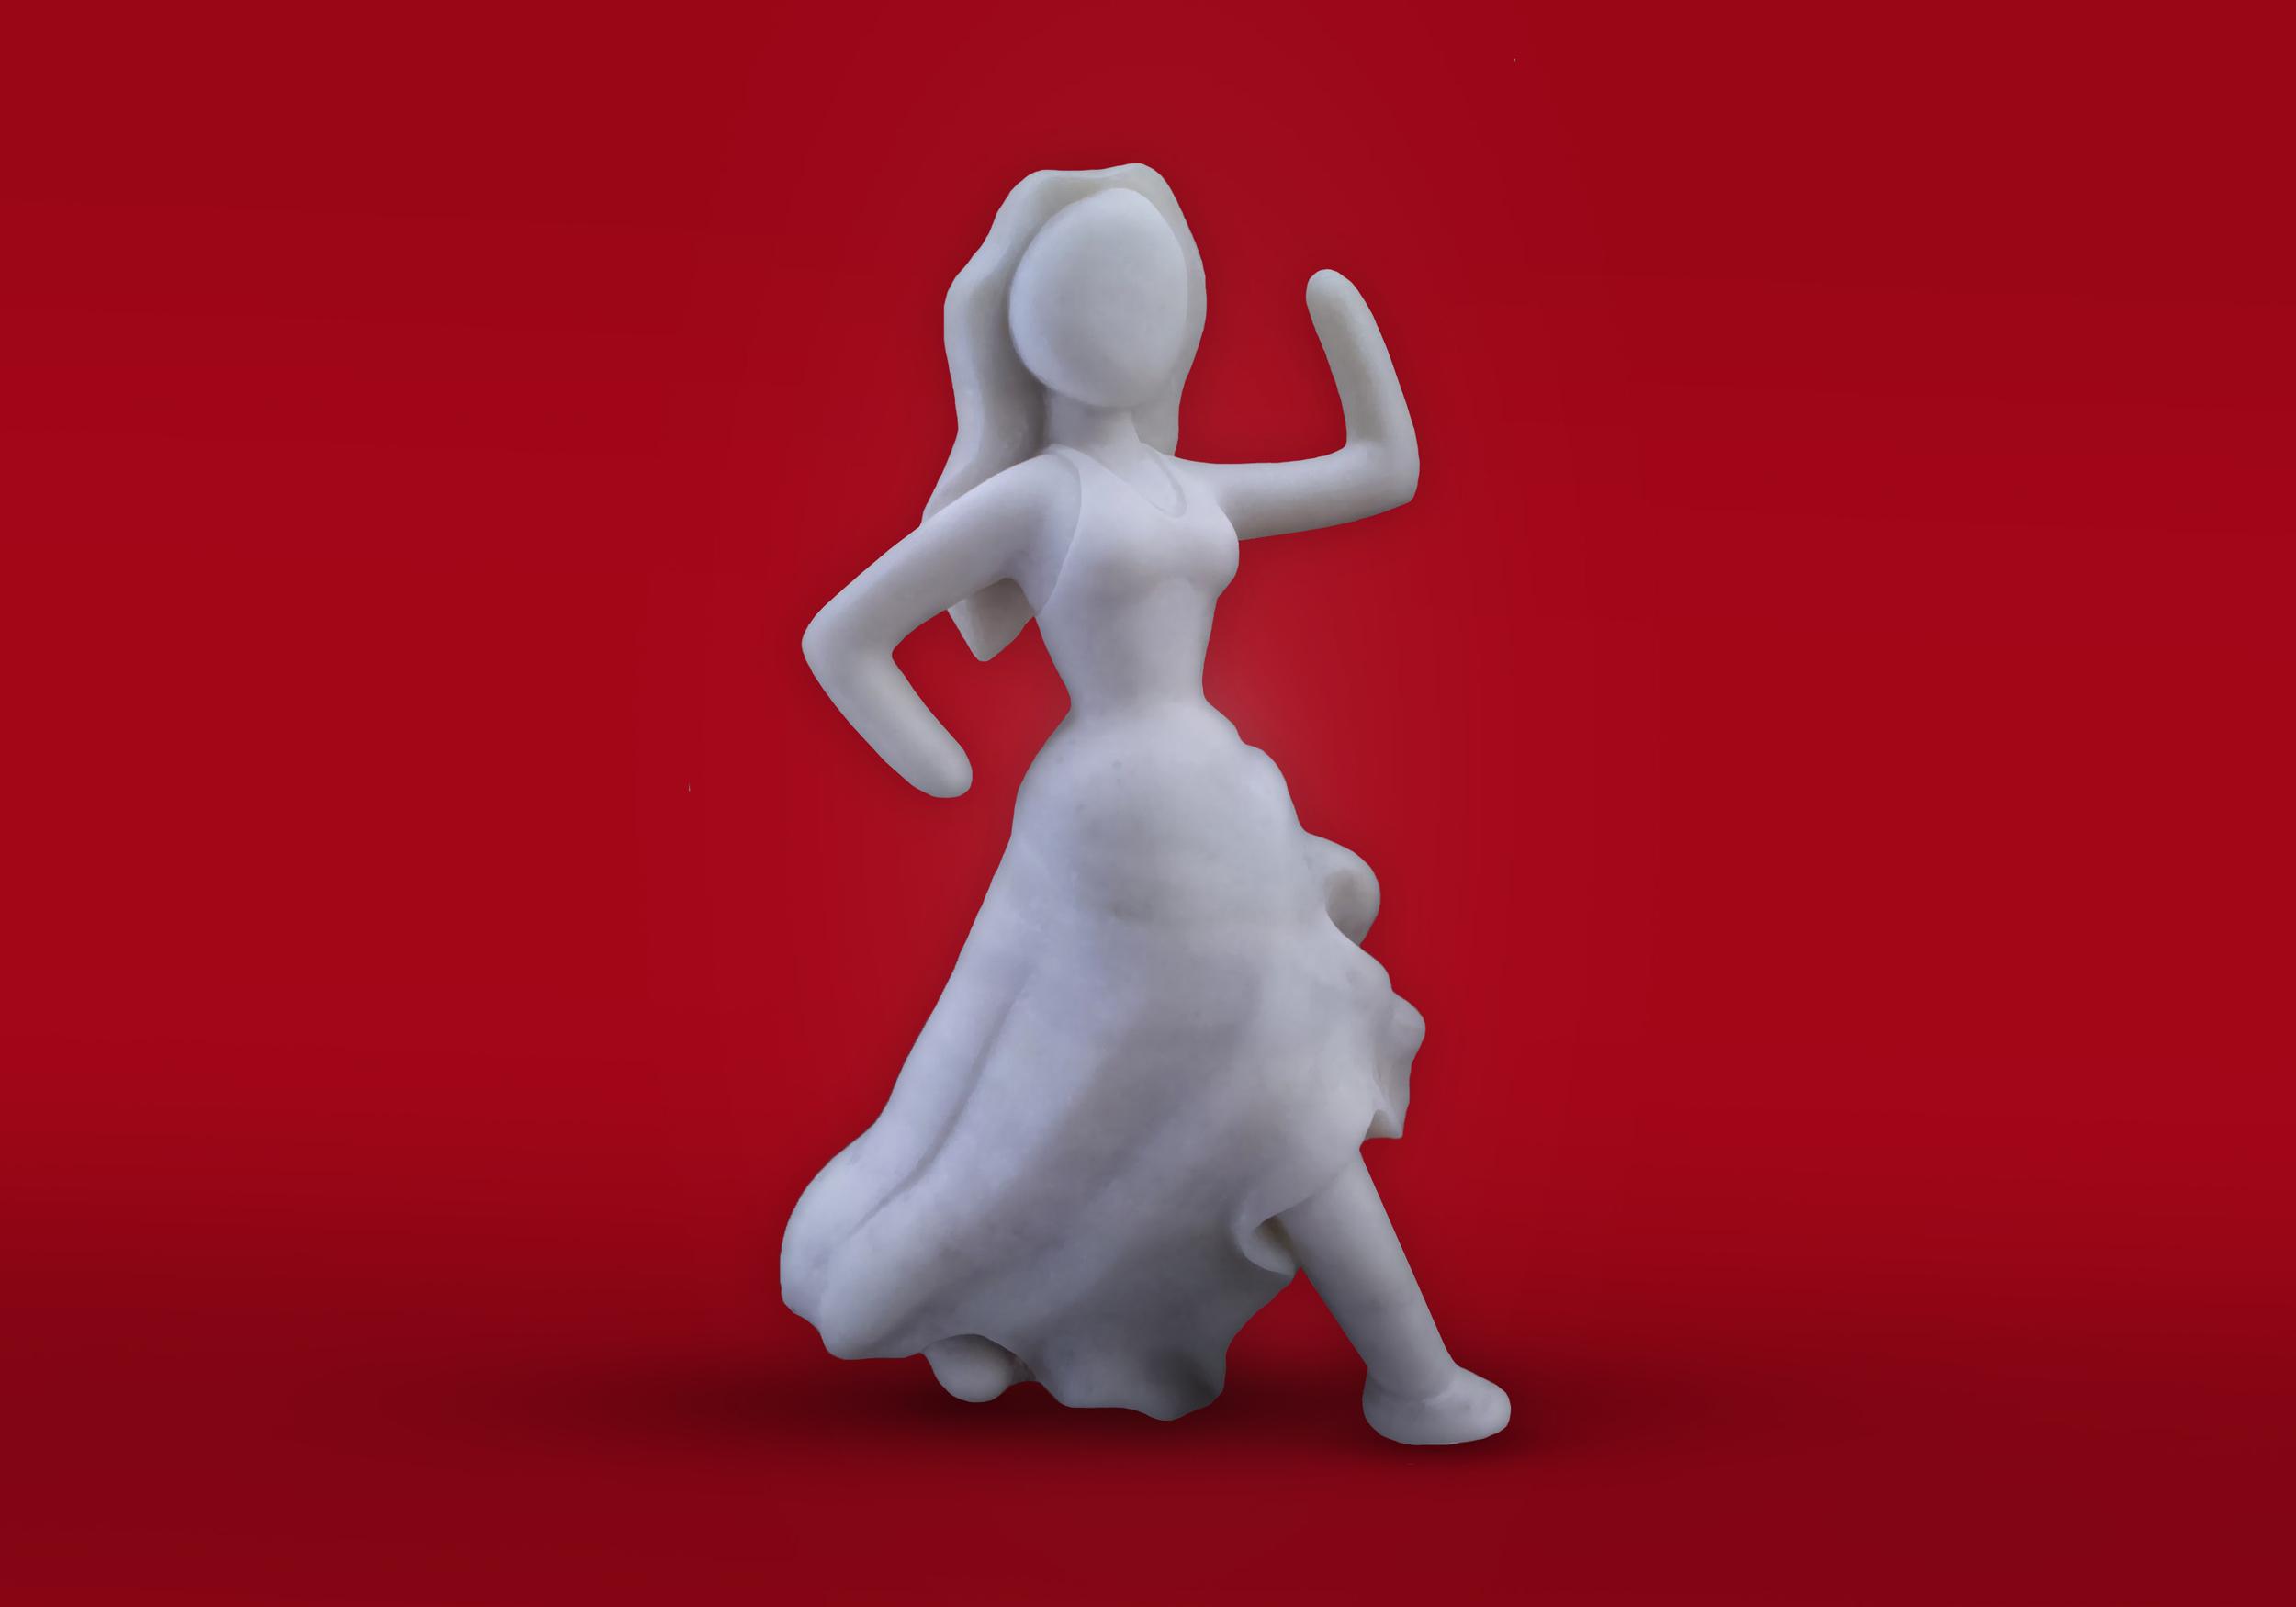 Woman_in_the_red_dress_Marble_Emoji_Matthew_LaPenta.jpg